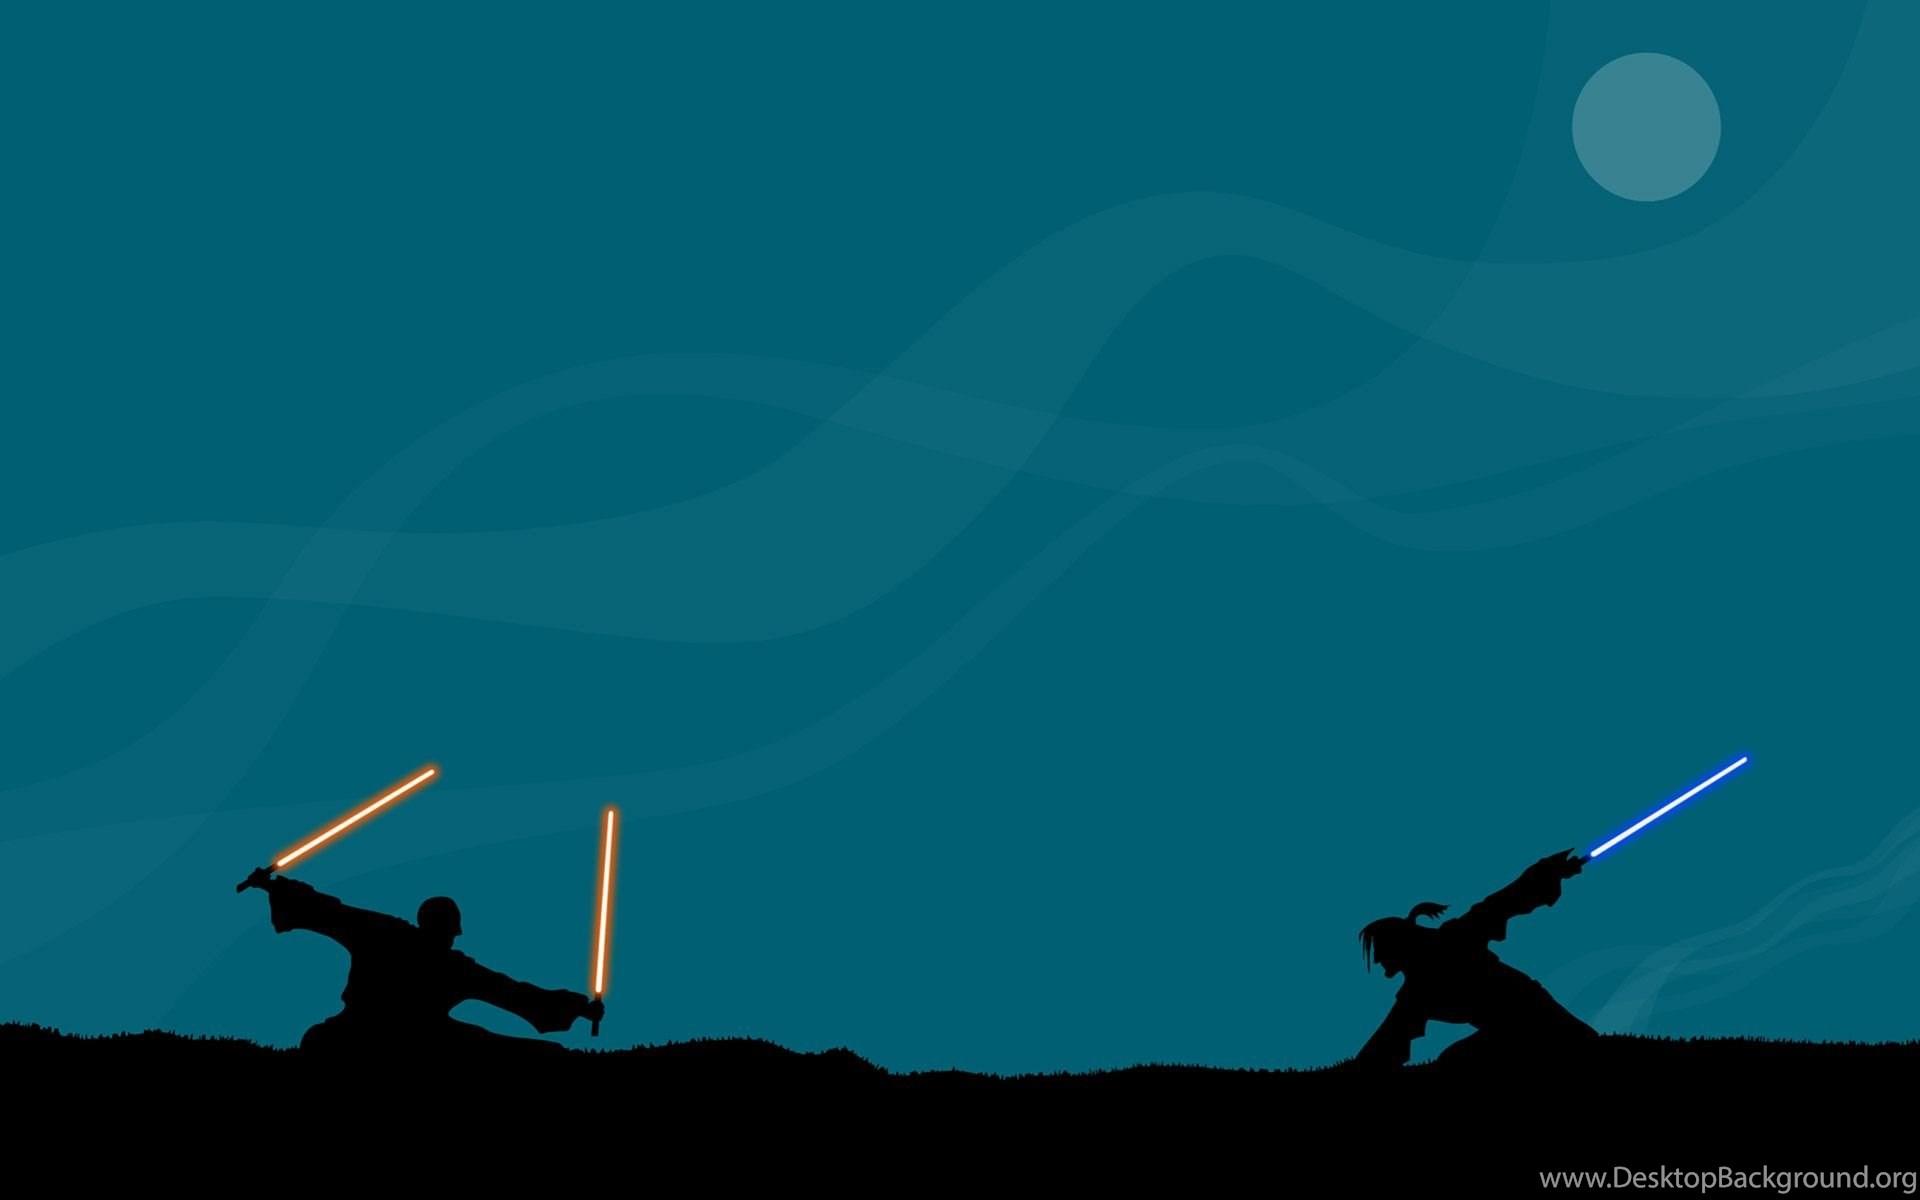 Star Wars Computer Wallpapers Desktop Backgrounds Desktop Background